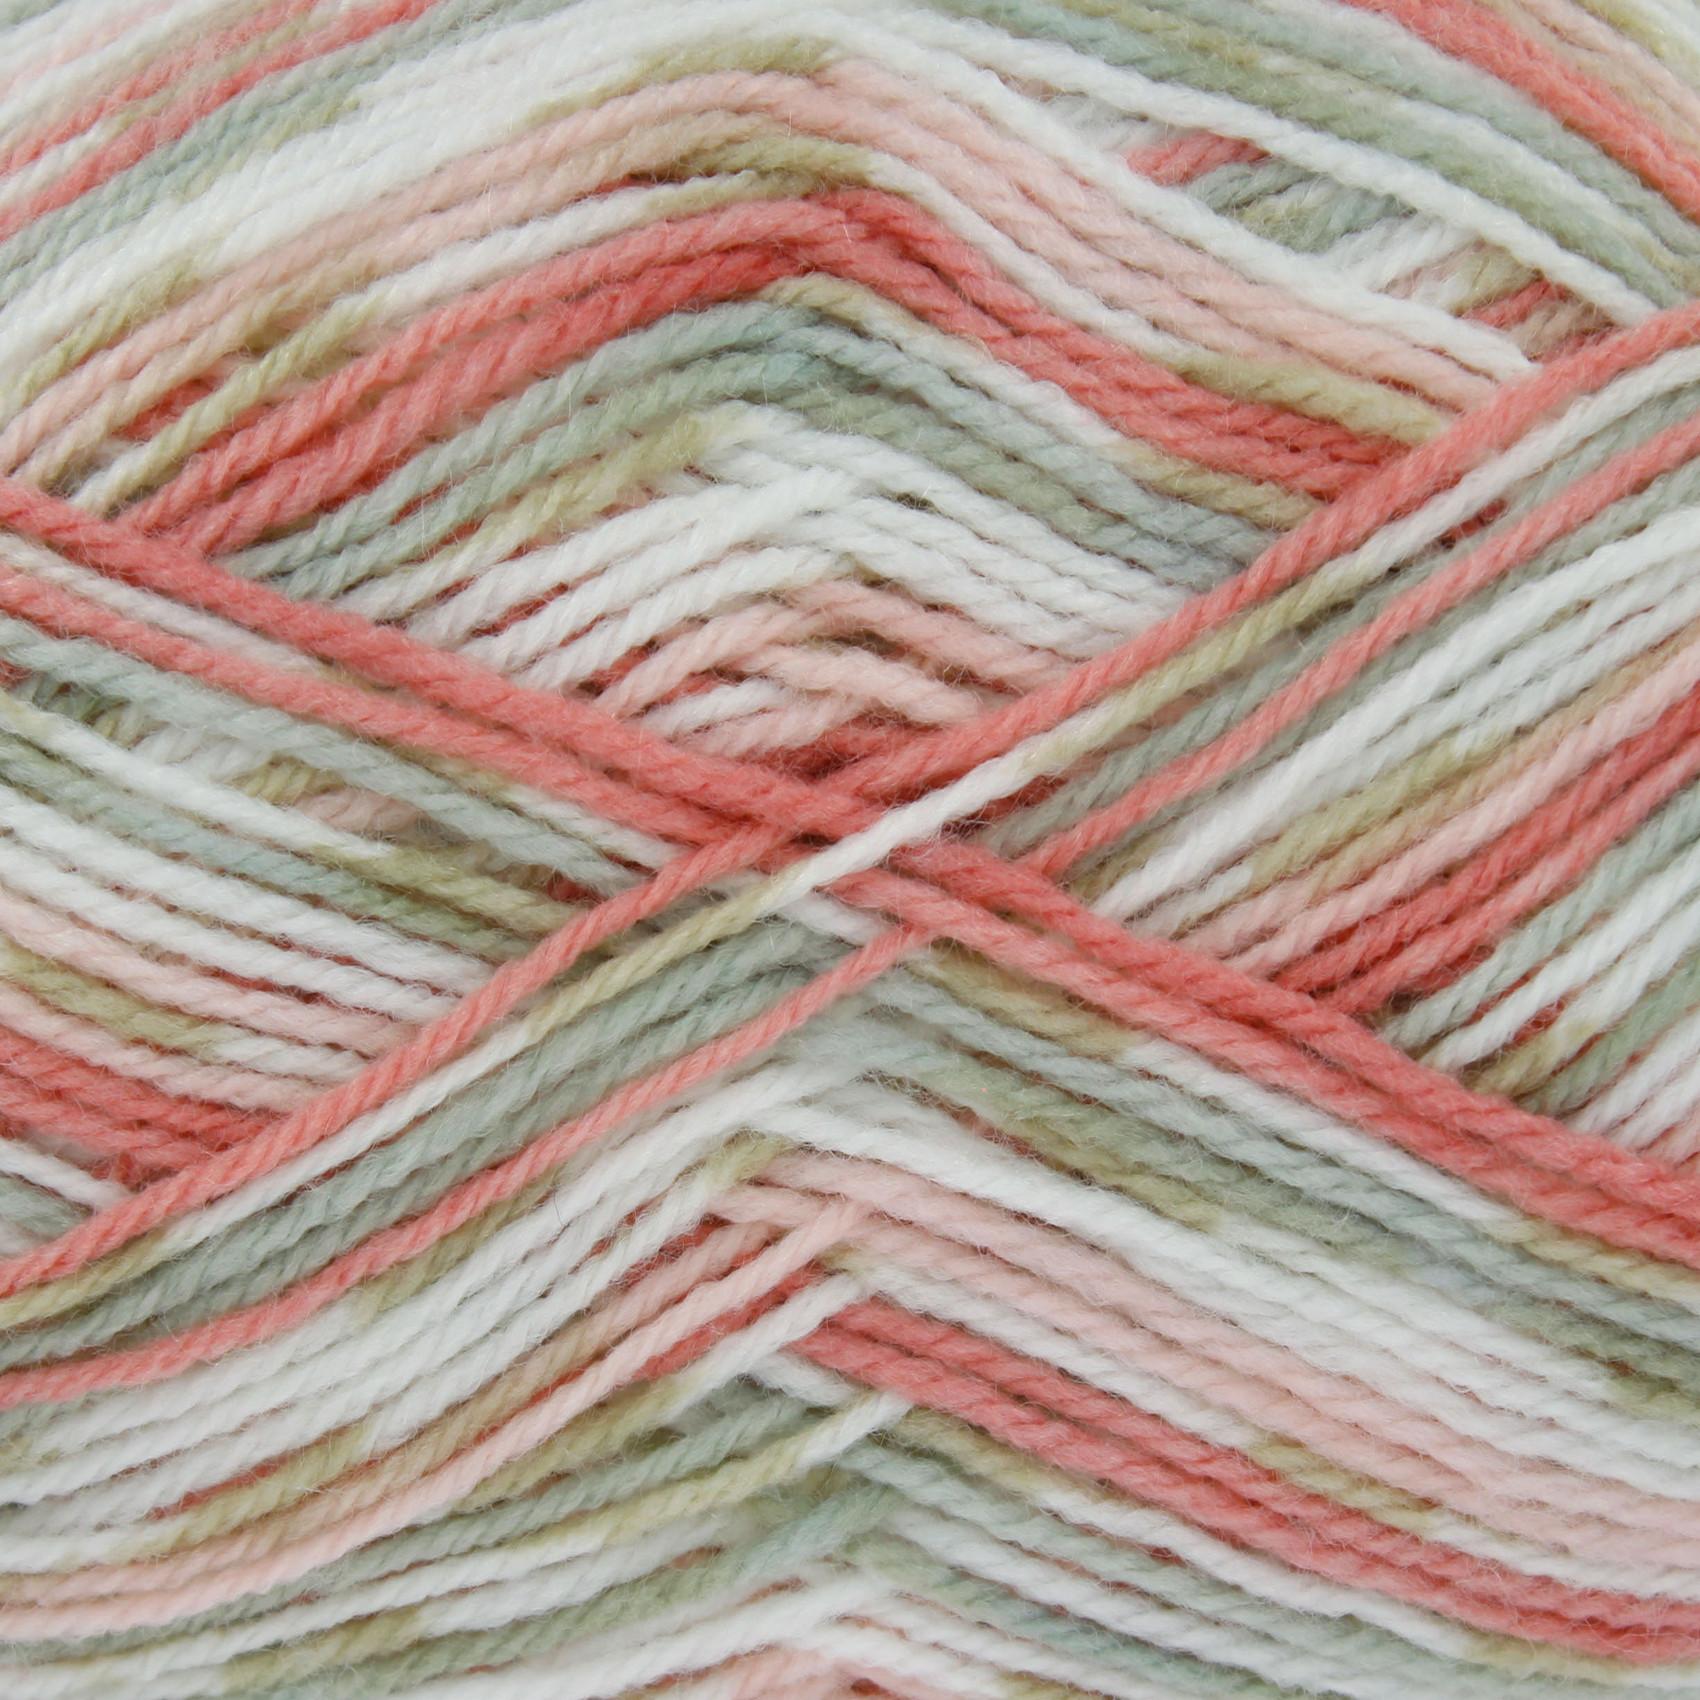 Free Knitting Patterns Dk Yarn : Double Knit 100g Ball Comfort Prints DK Yarn King Cole Free Knitting Pattern ...